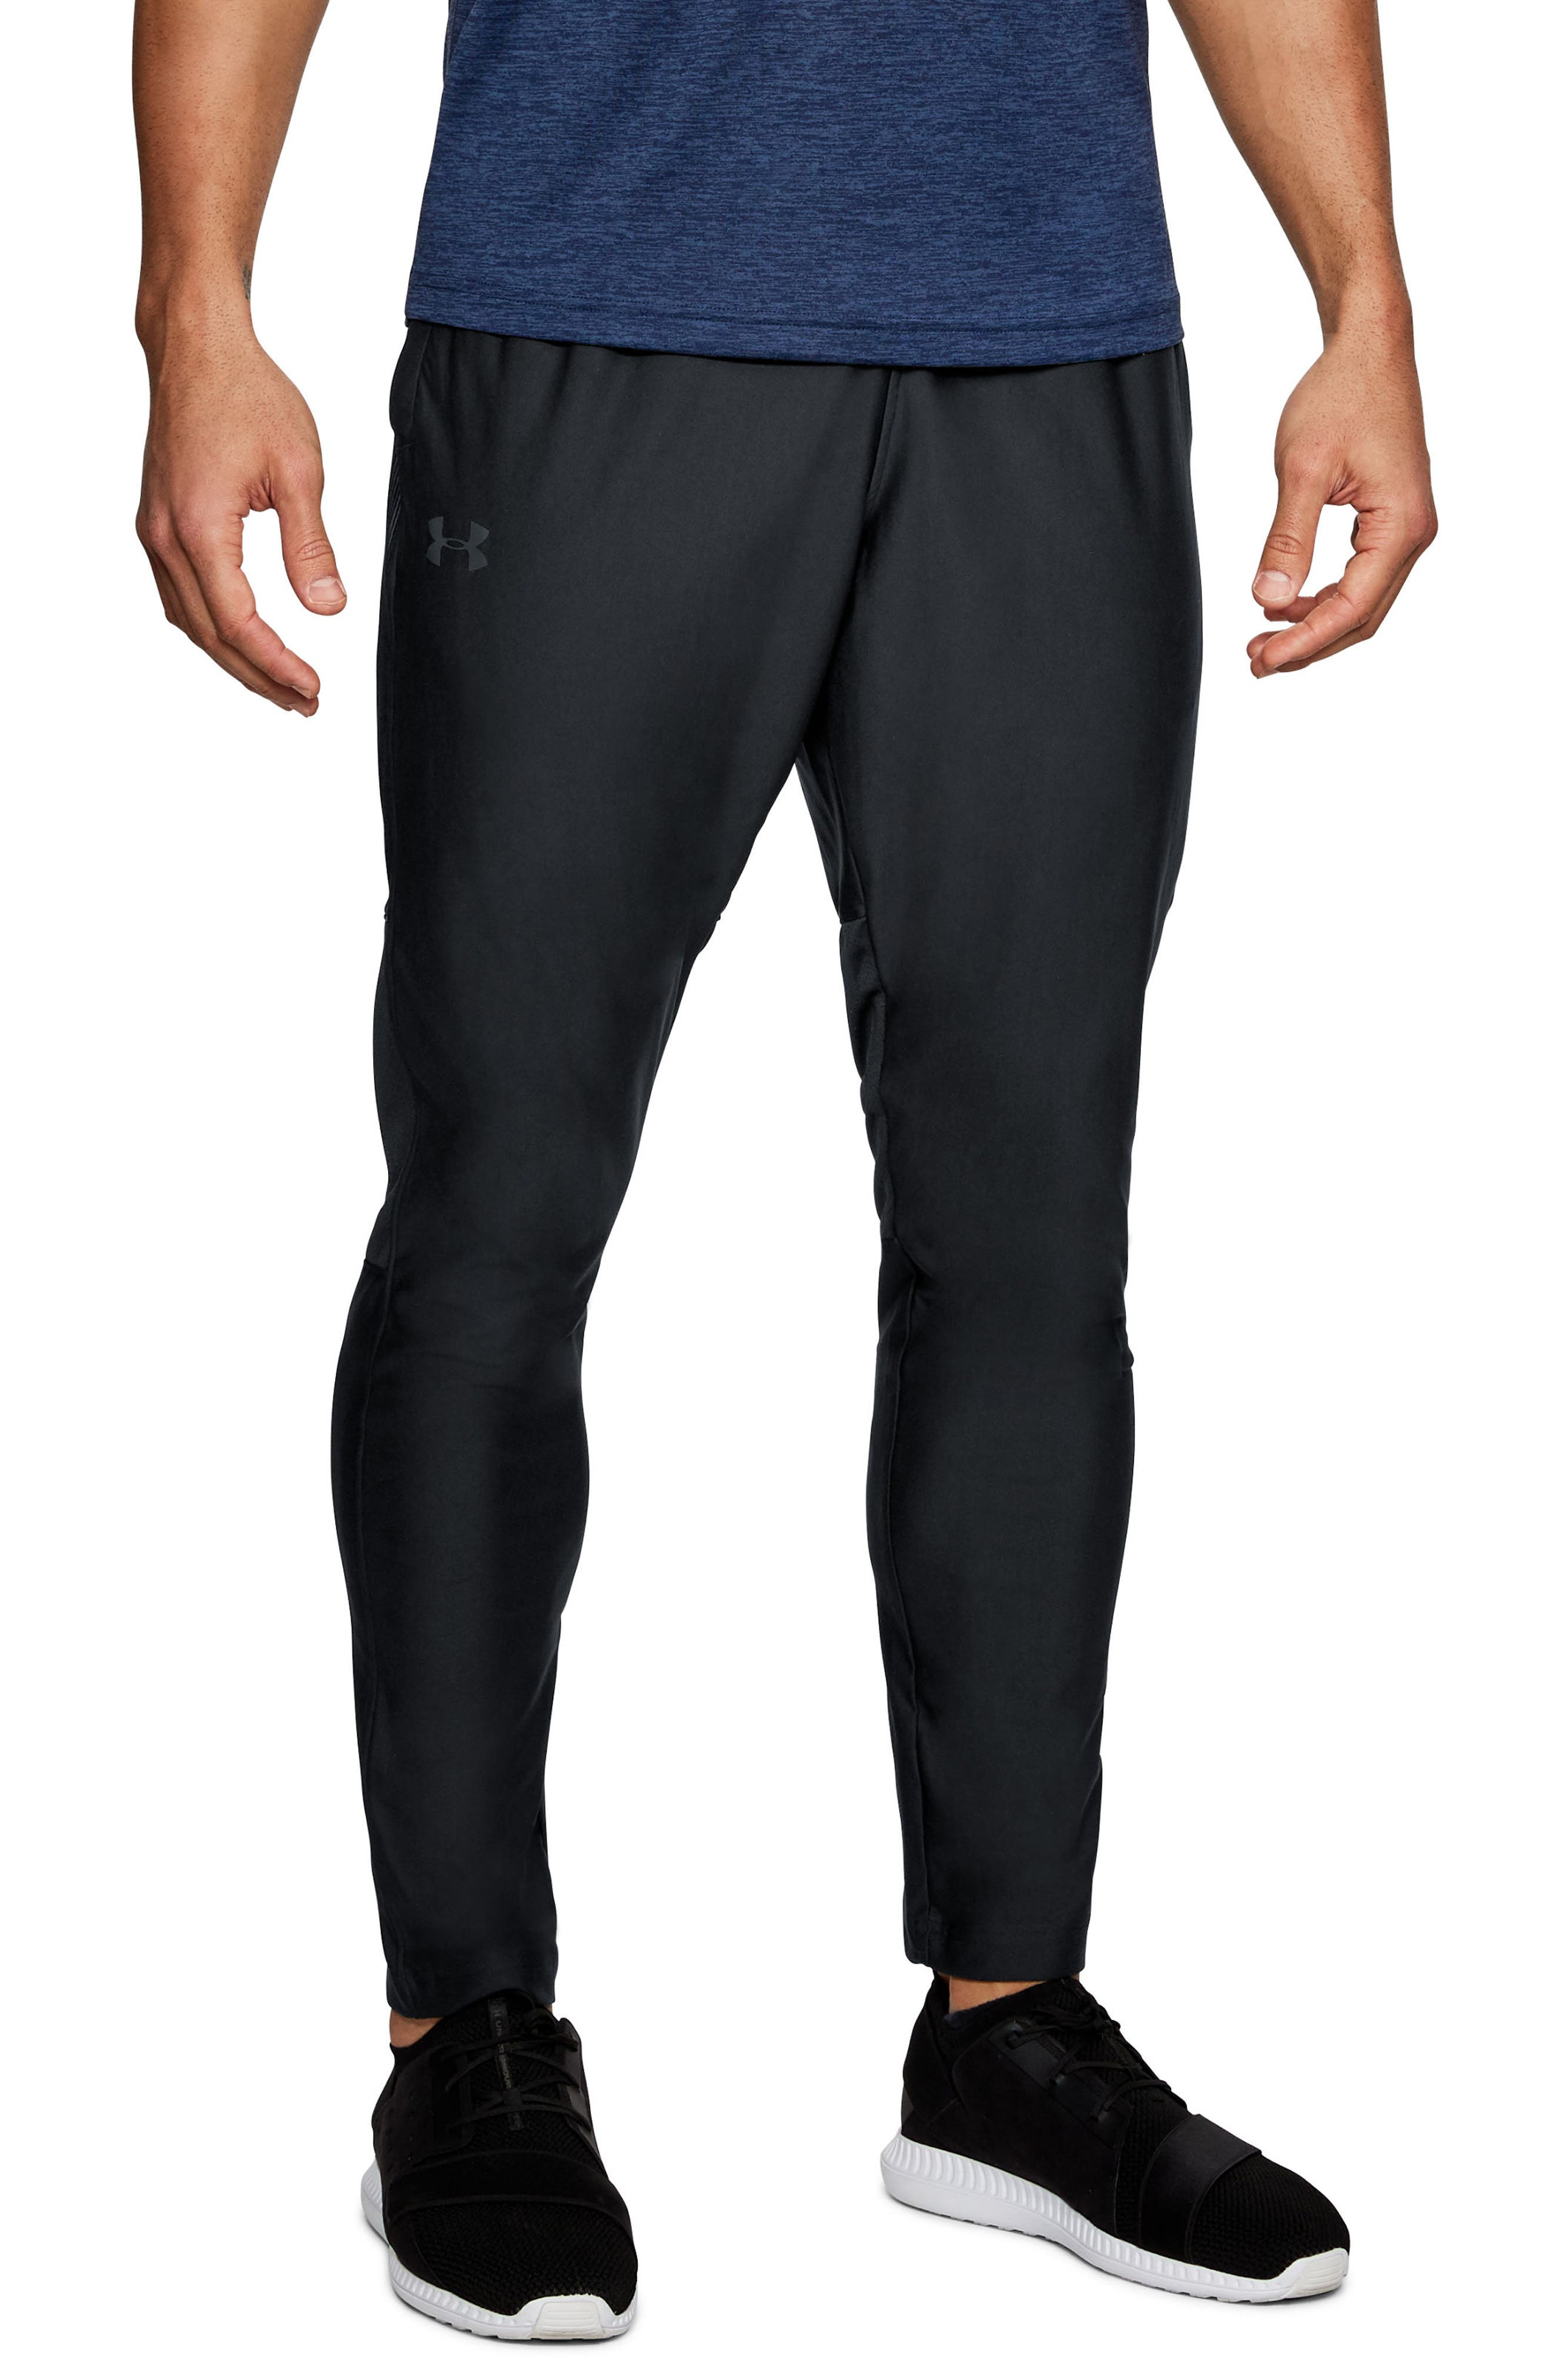 Threadborne Vanish Pants,                         Main,                         color, Black/ Anthracite